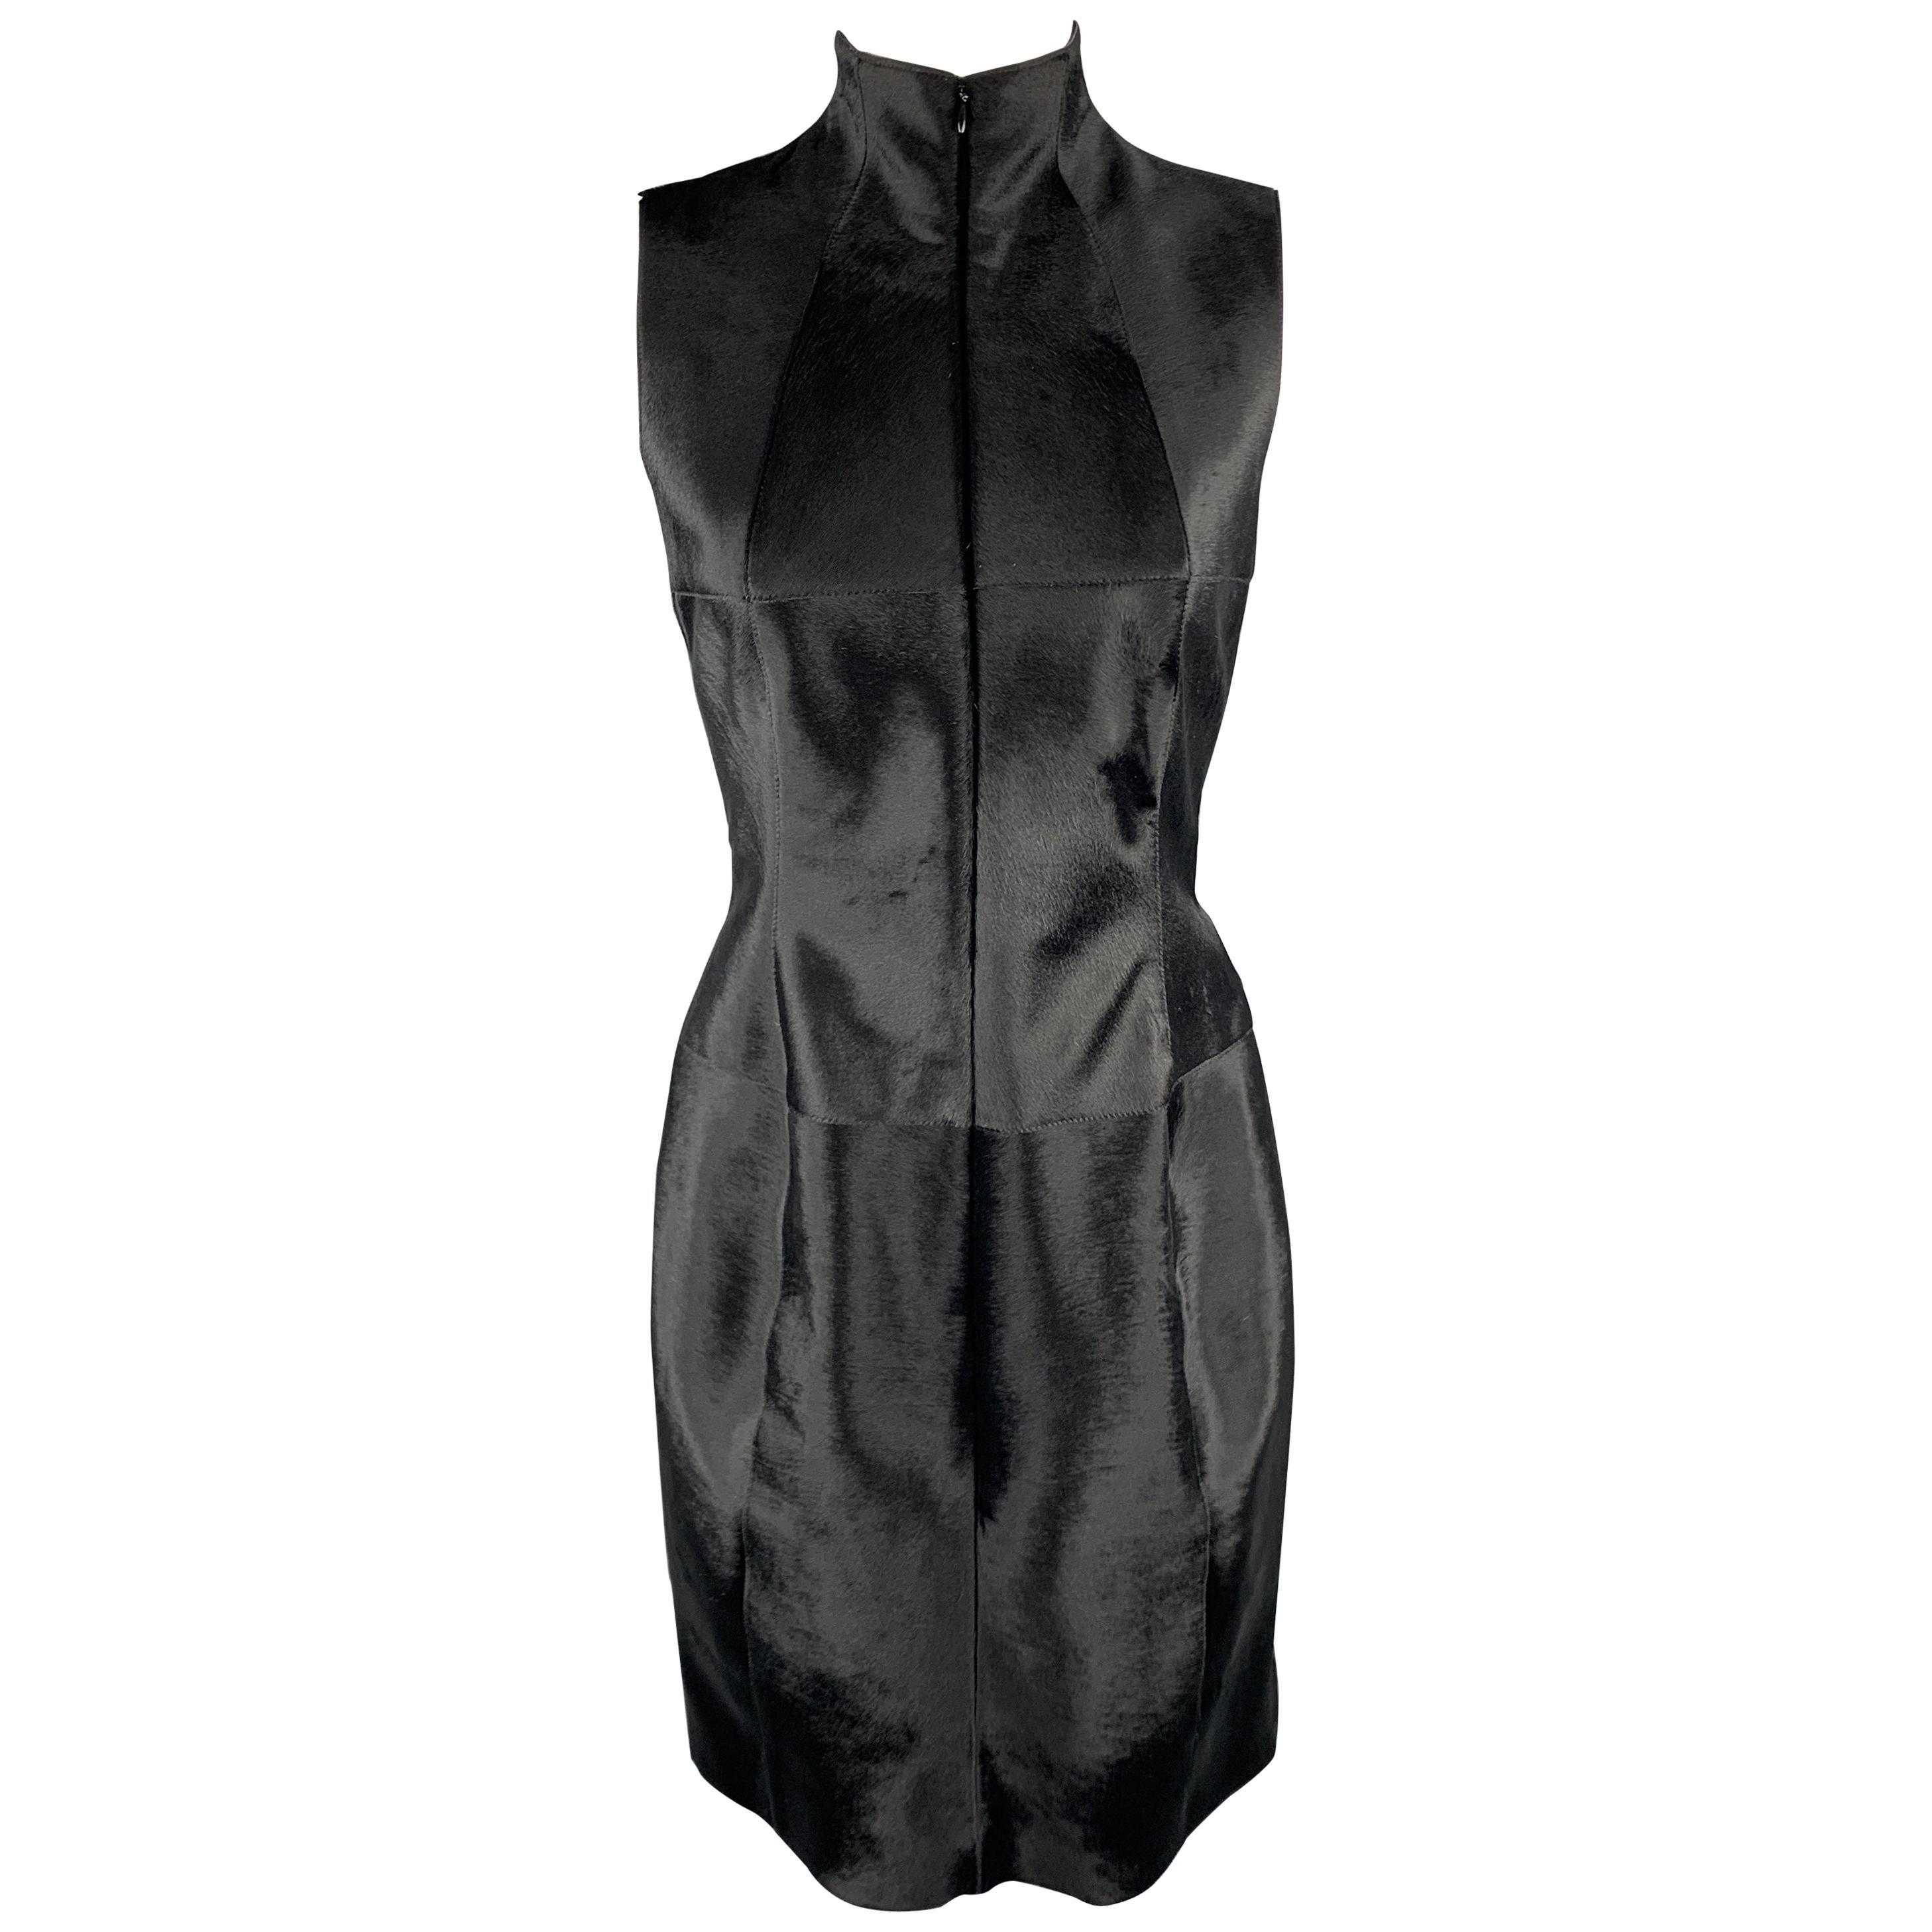 AKRIS 6 Black Pony Hair Leather Sleeveless Pleated Back High Neck Cocktail Dress